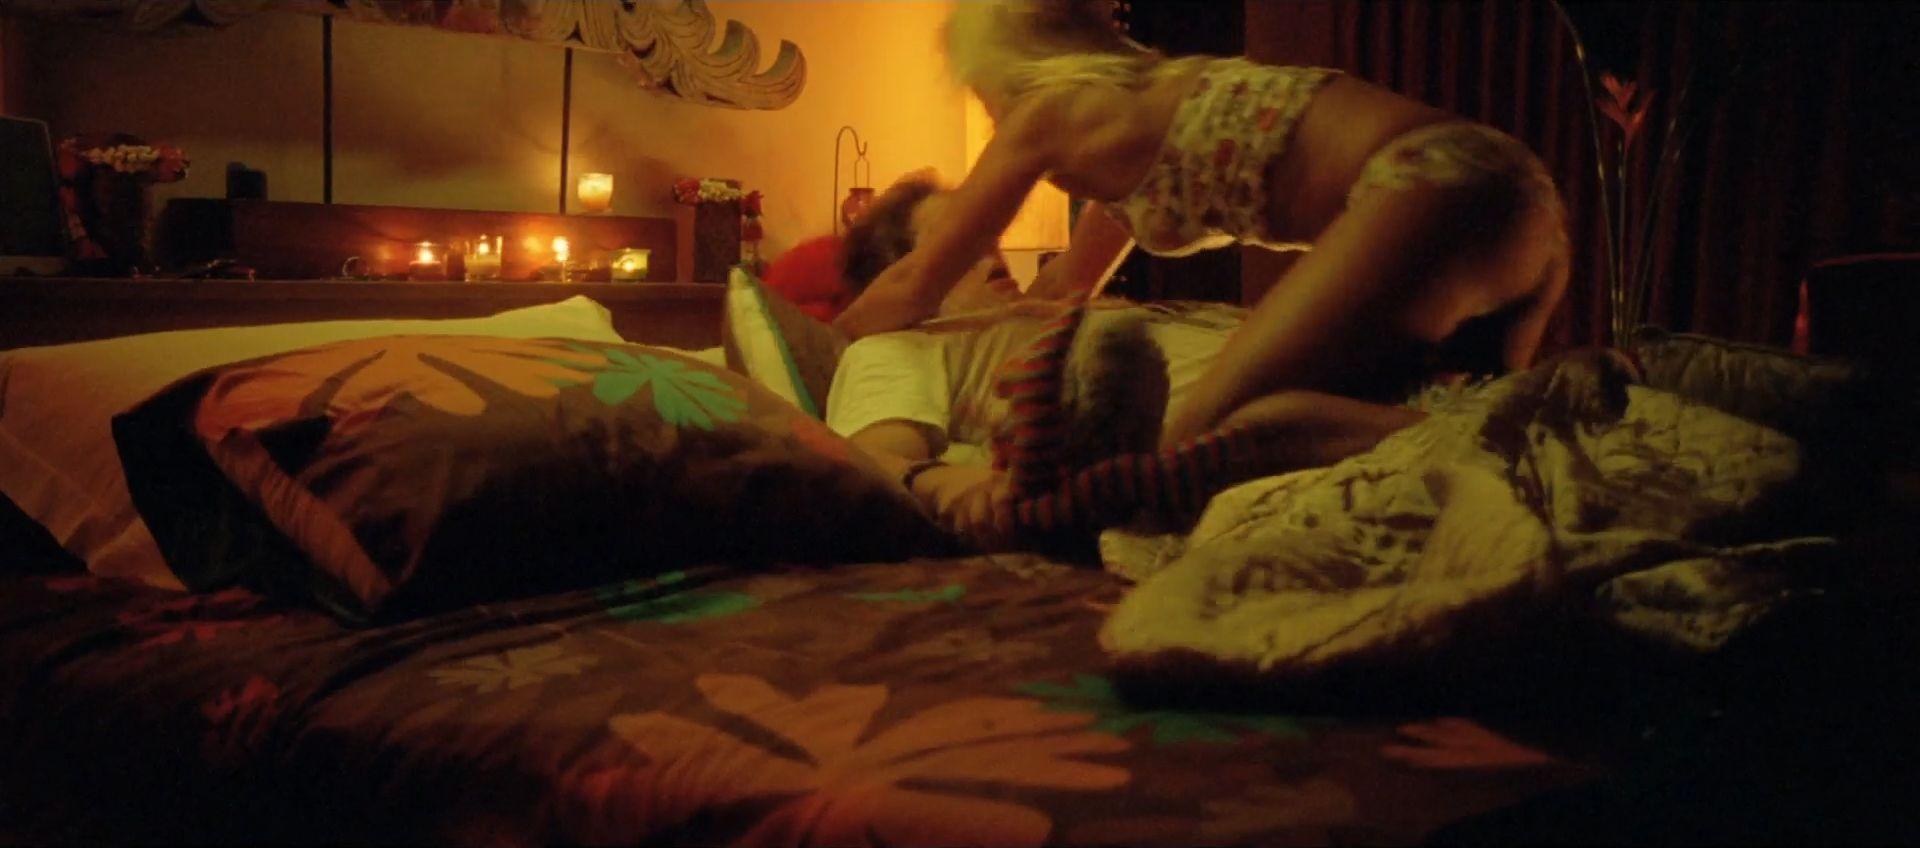 Эротика анастасия задорожная, Голая Анастасия Задорожная фото (75 фотографий.) 2 фотография